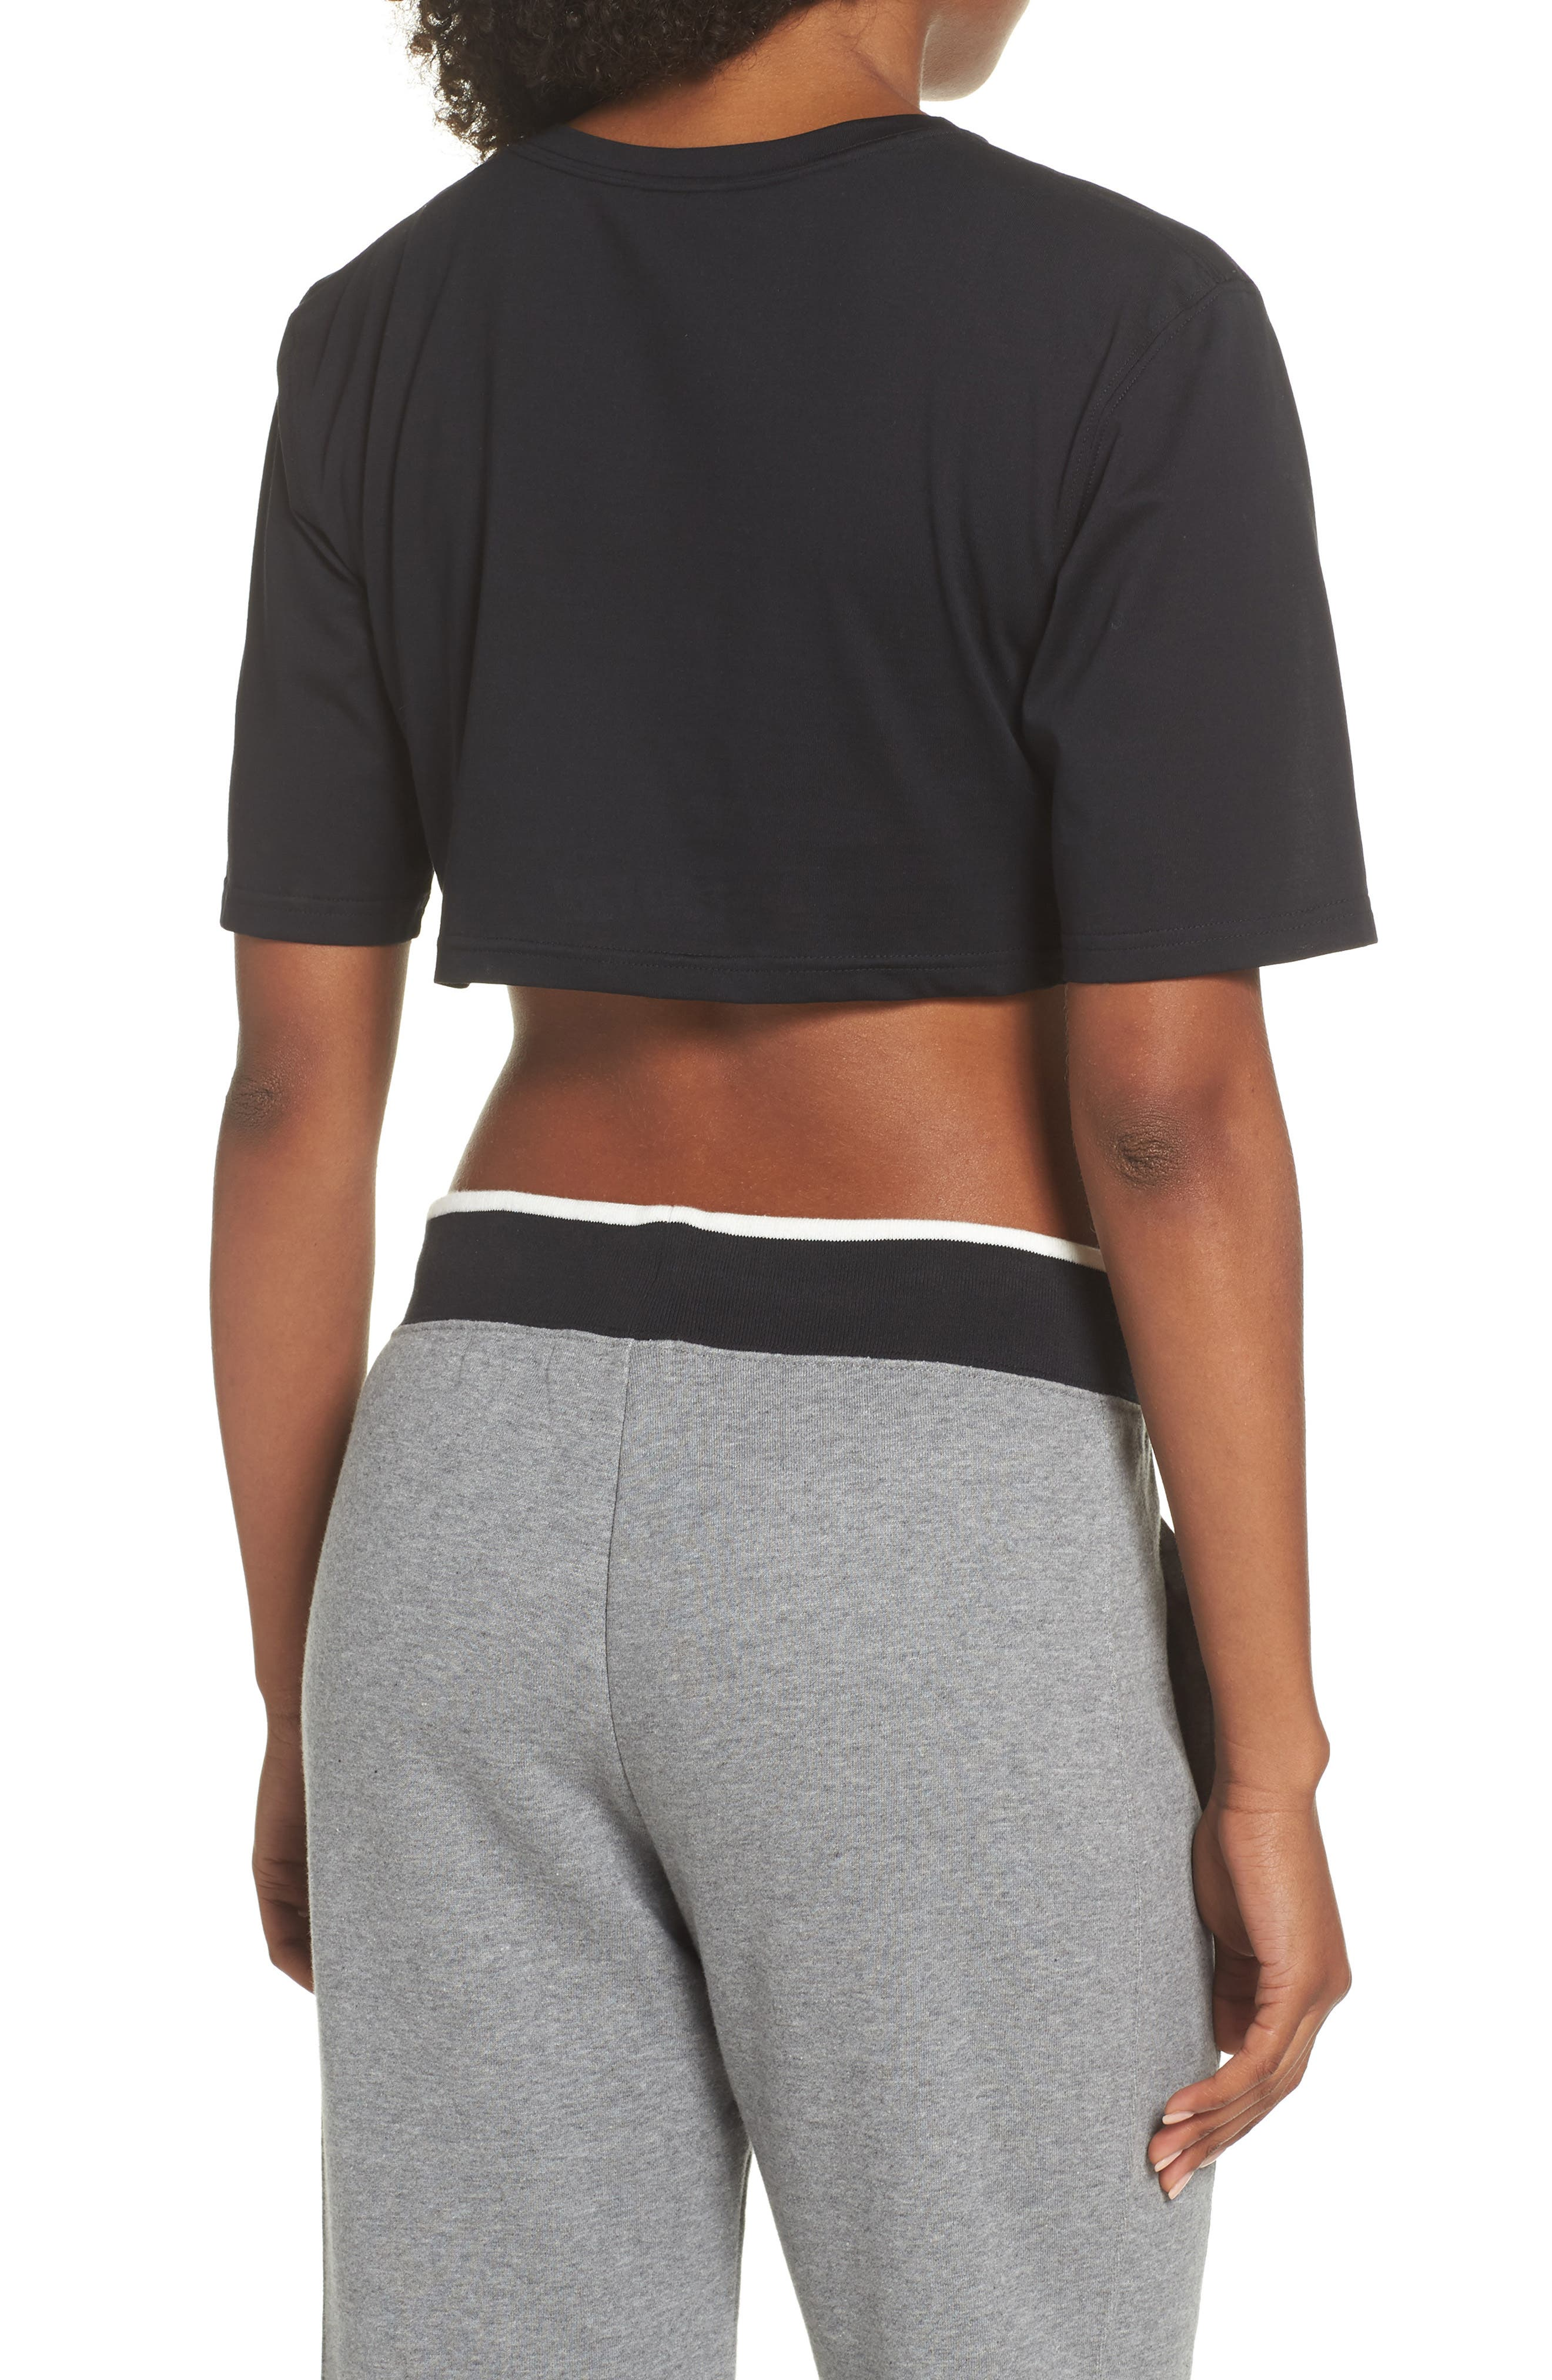 NikeLab Collection Jersey Crop Top,                             Alternate thumbnail 2, color,                             BLACK/ BLACK